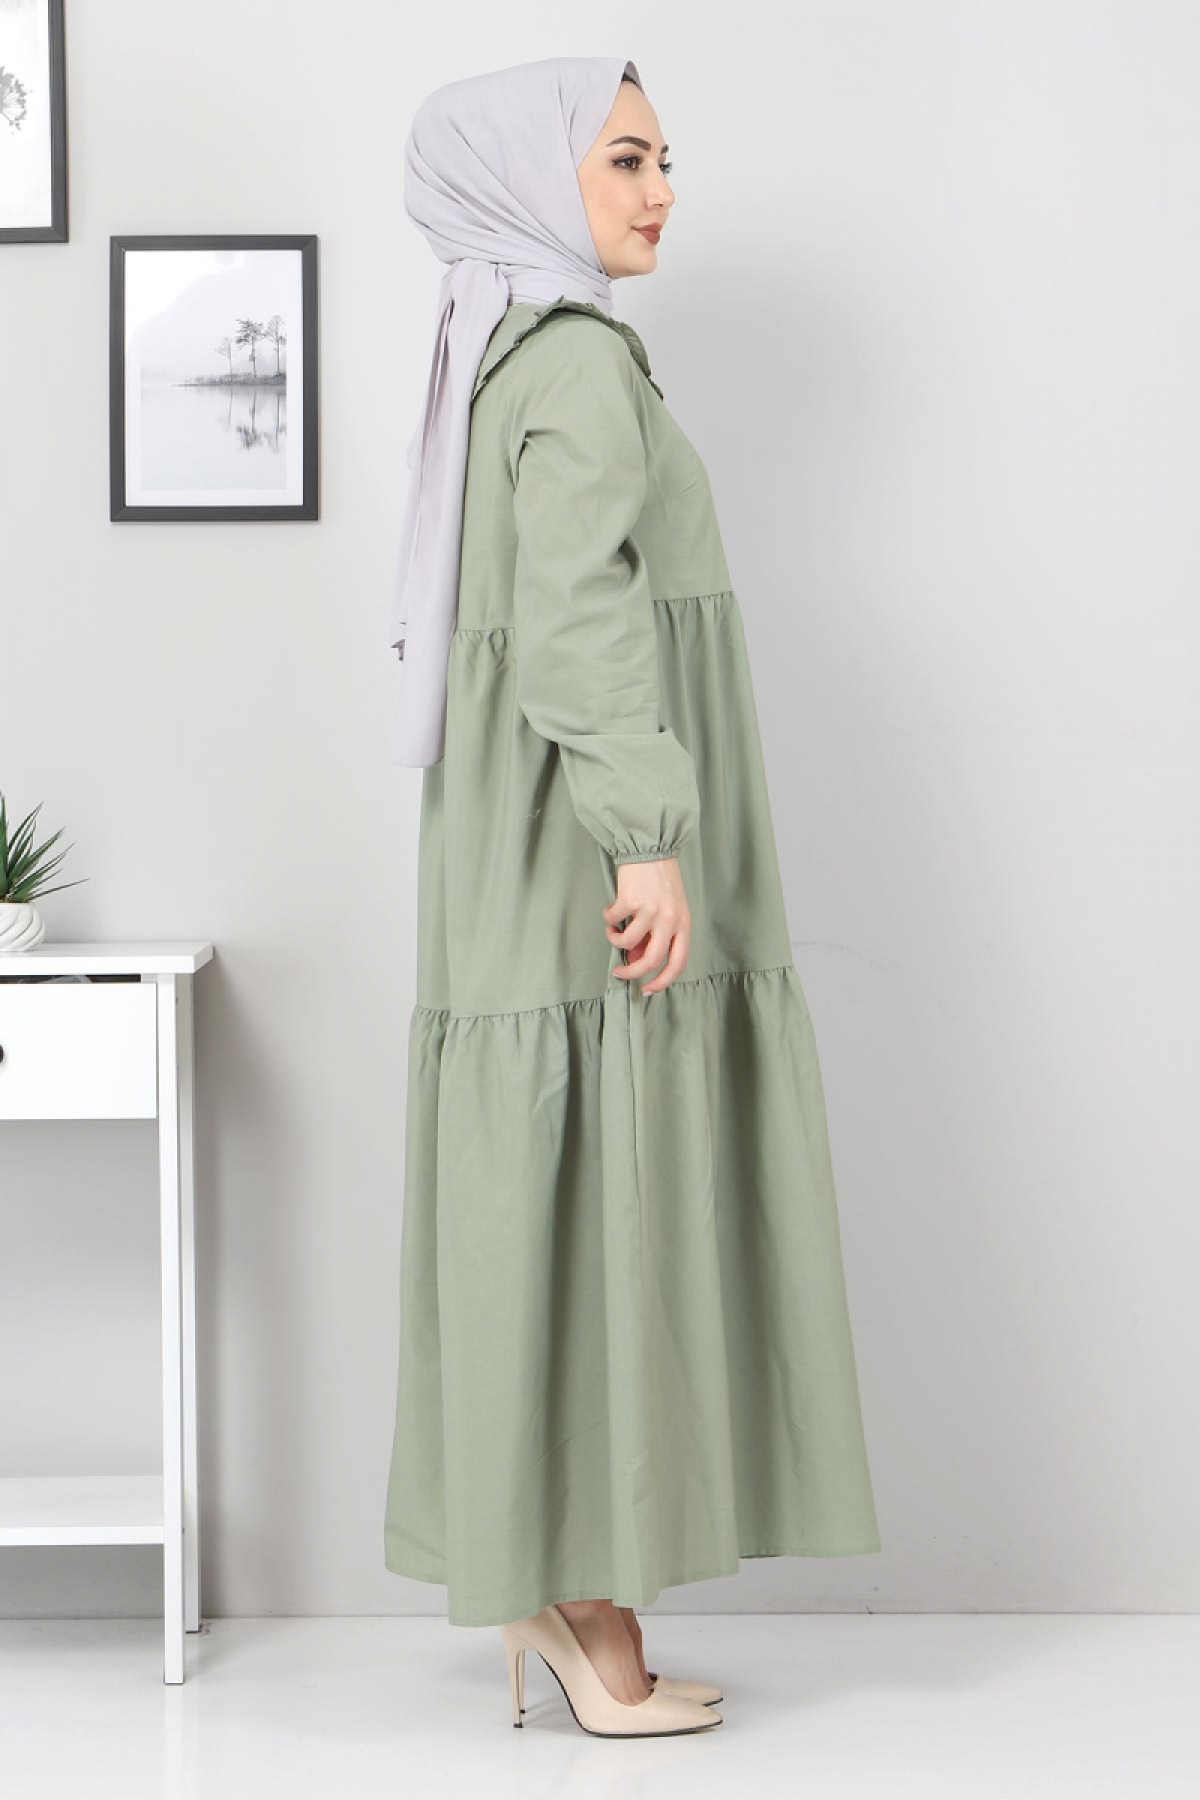 Bebe Yaka Tesettür Elbise TSD0706 Mint